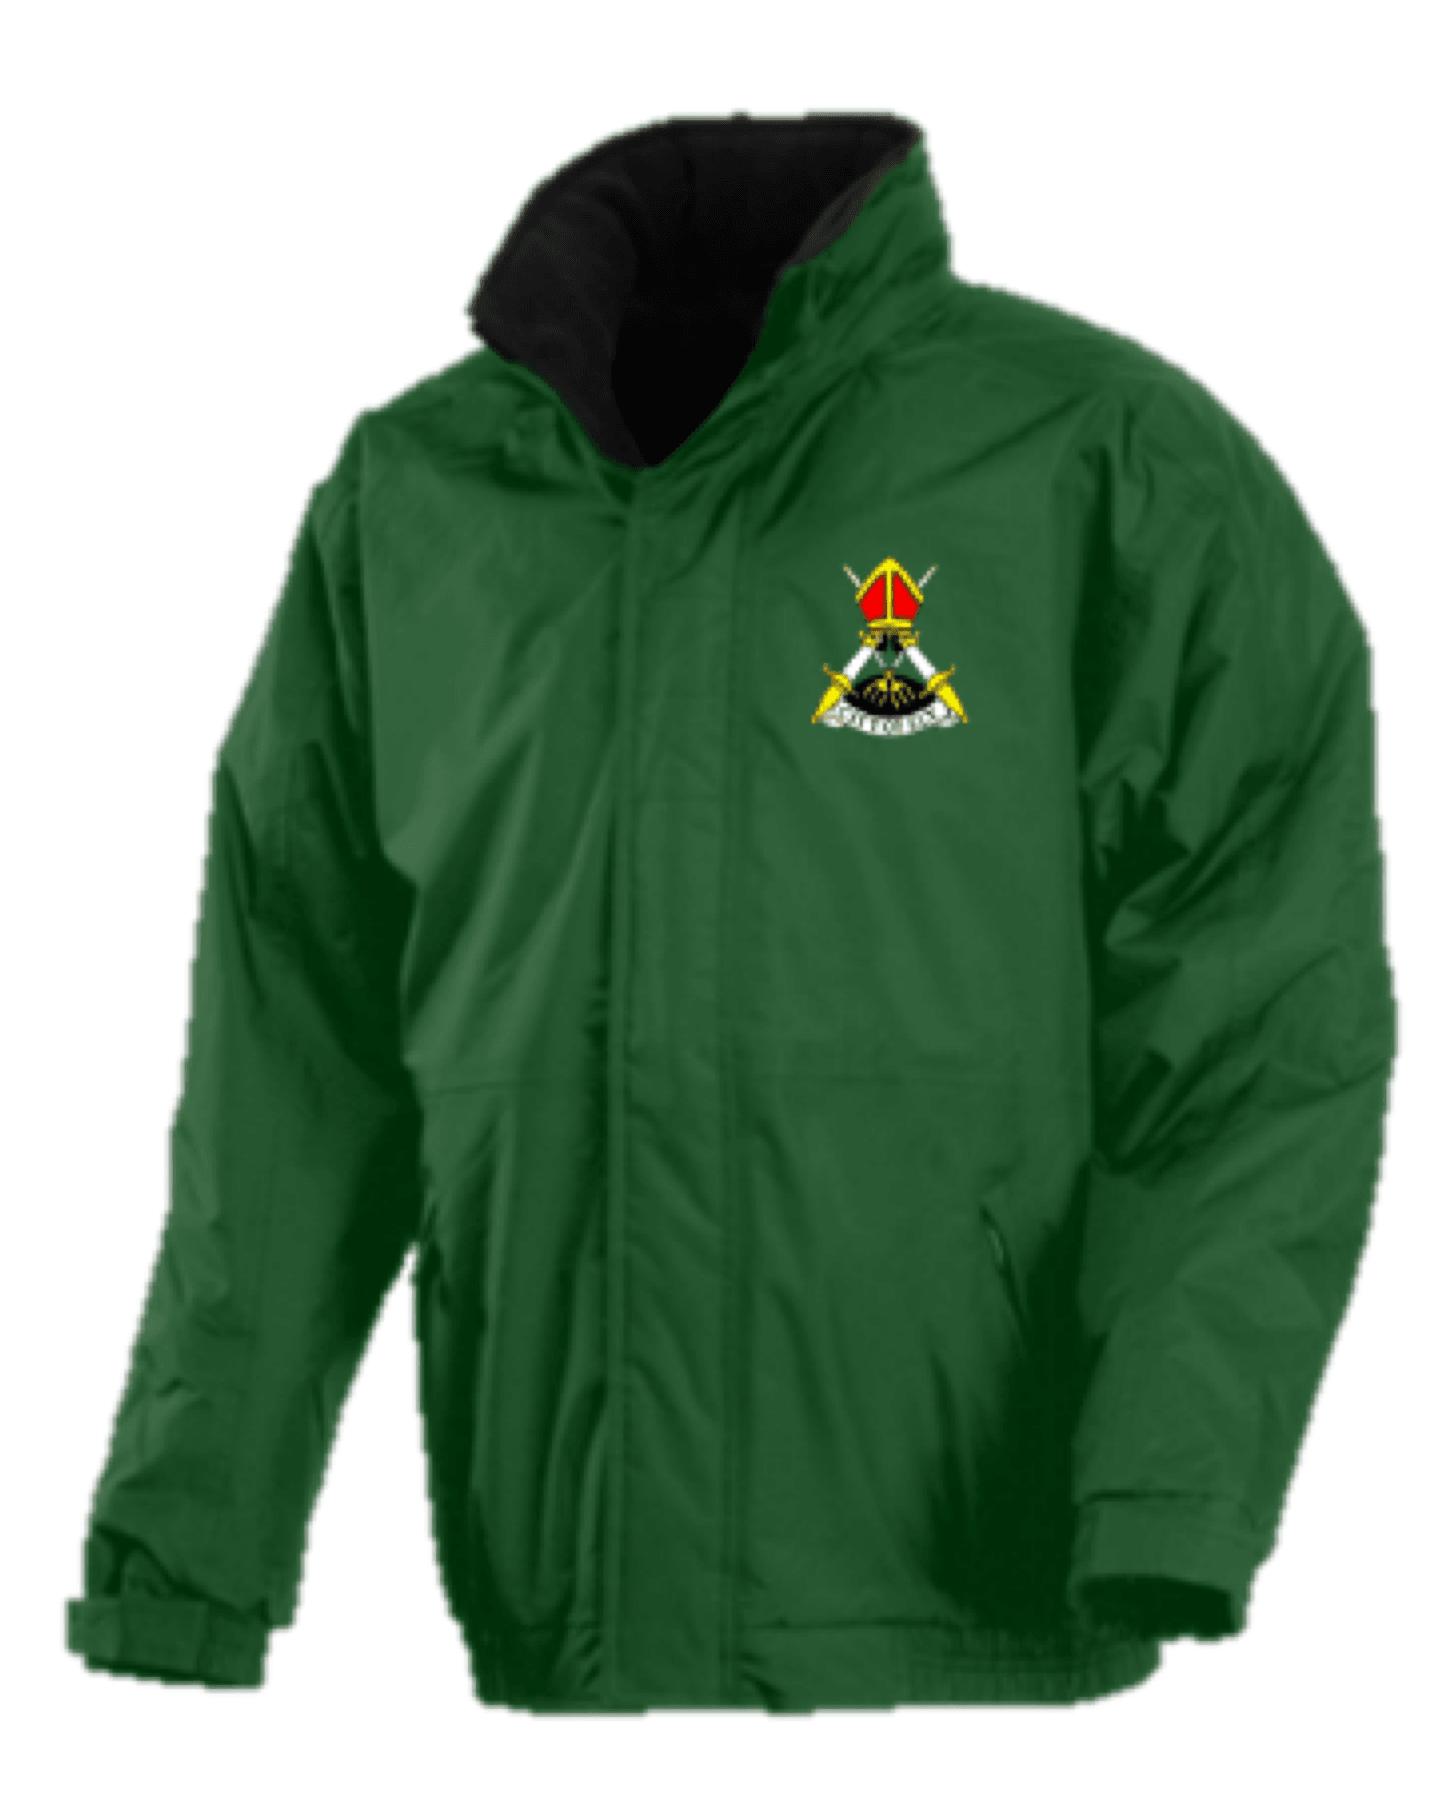 Ely City Hockey Club Jacket